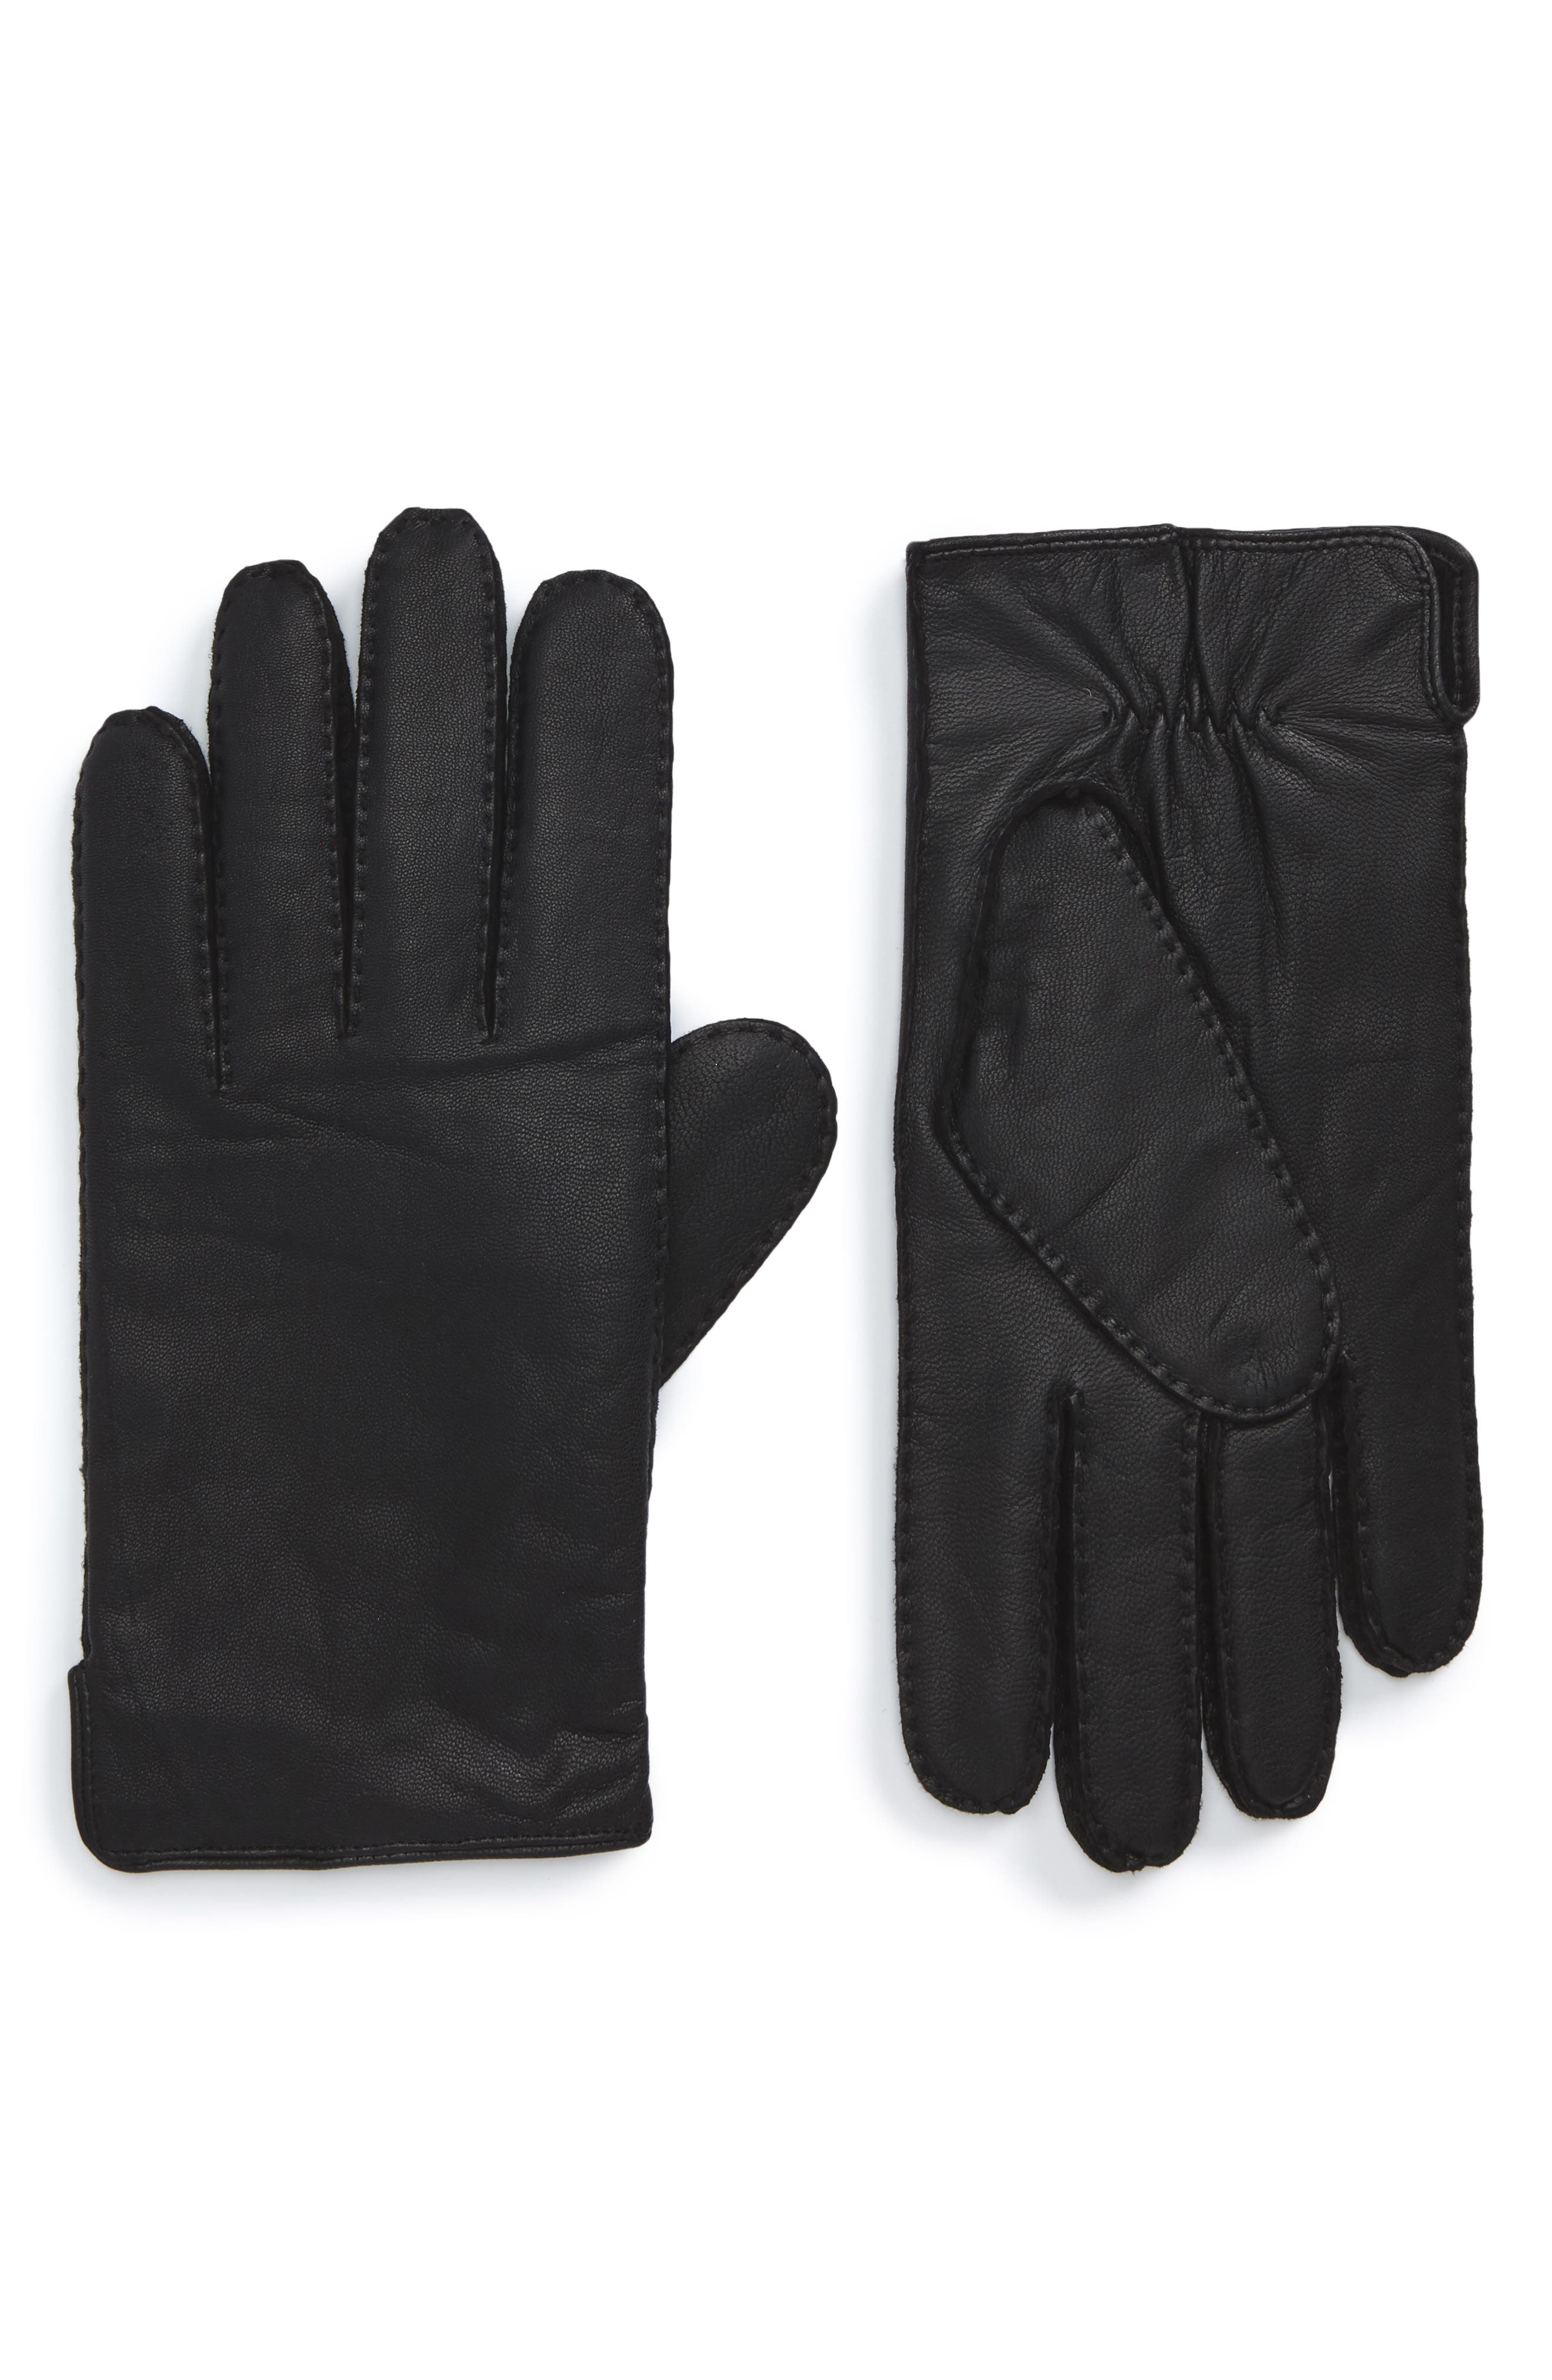 Kanton Leather Gloves,                         Main,                         color, Black